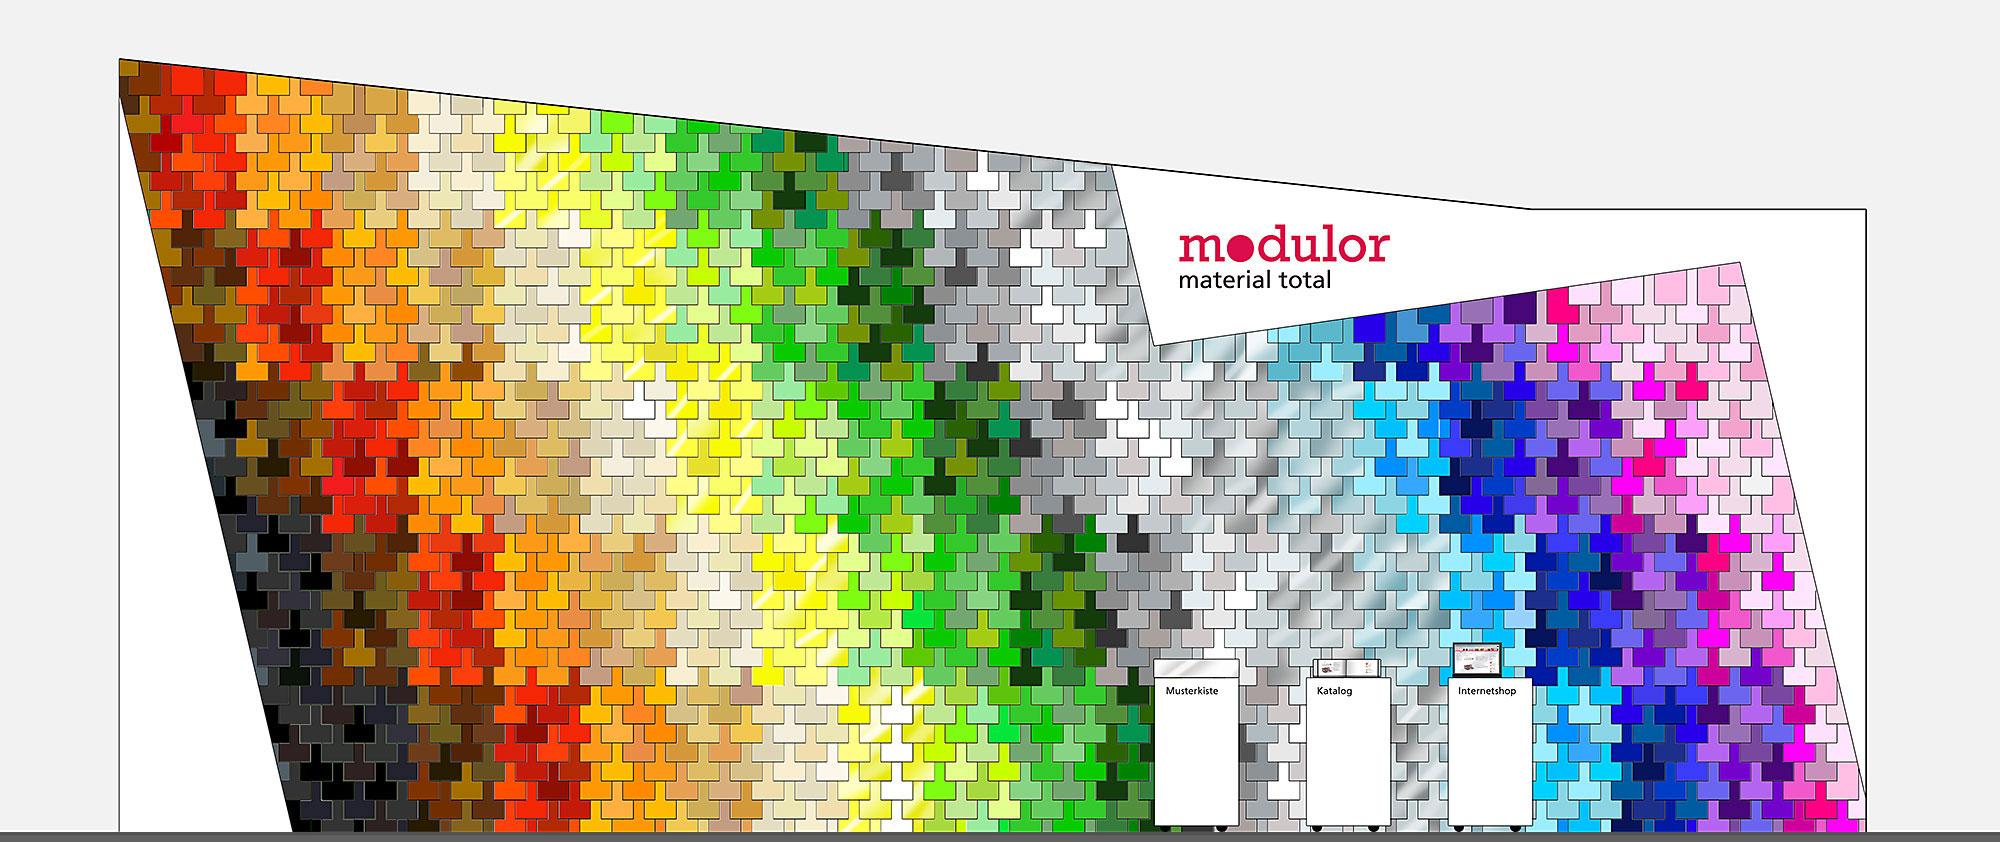 Modulor-messe–conzept-material-total-messe-close-wand-bunt-color-kreative-berlin-shop